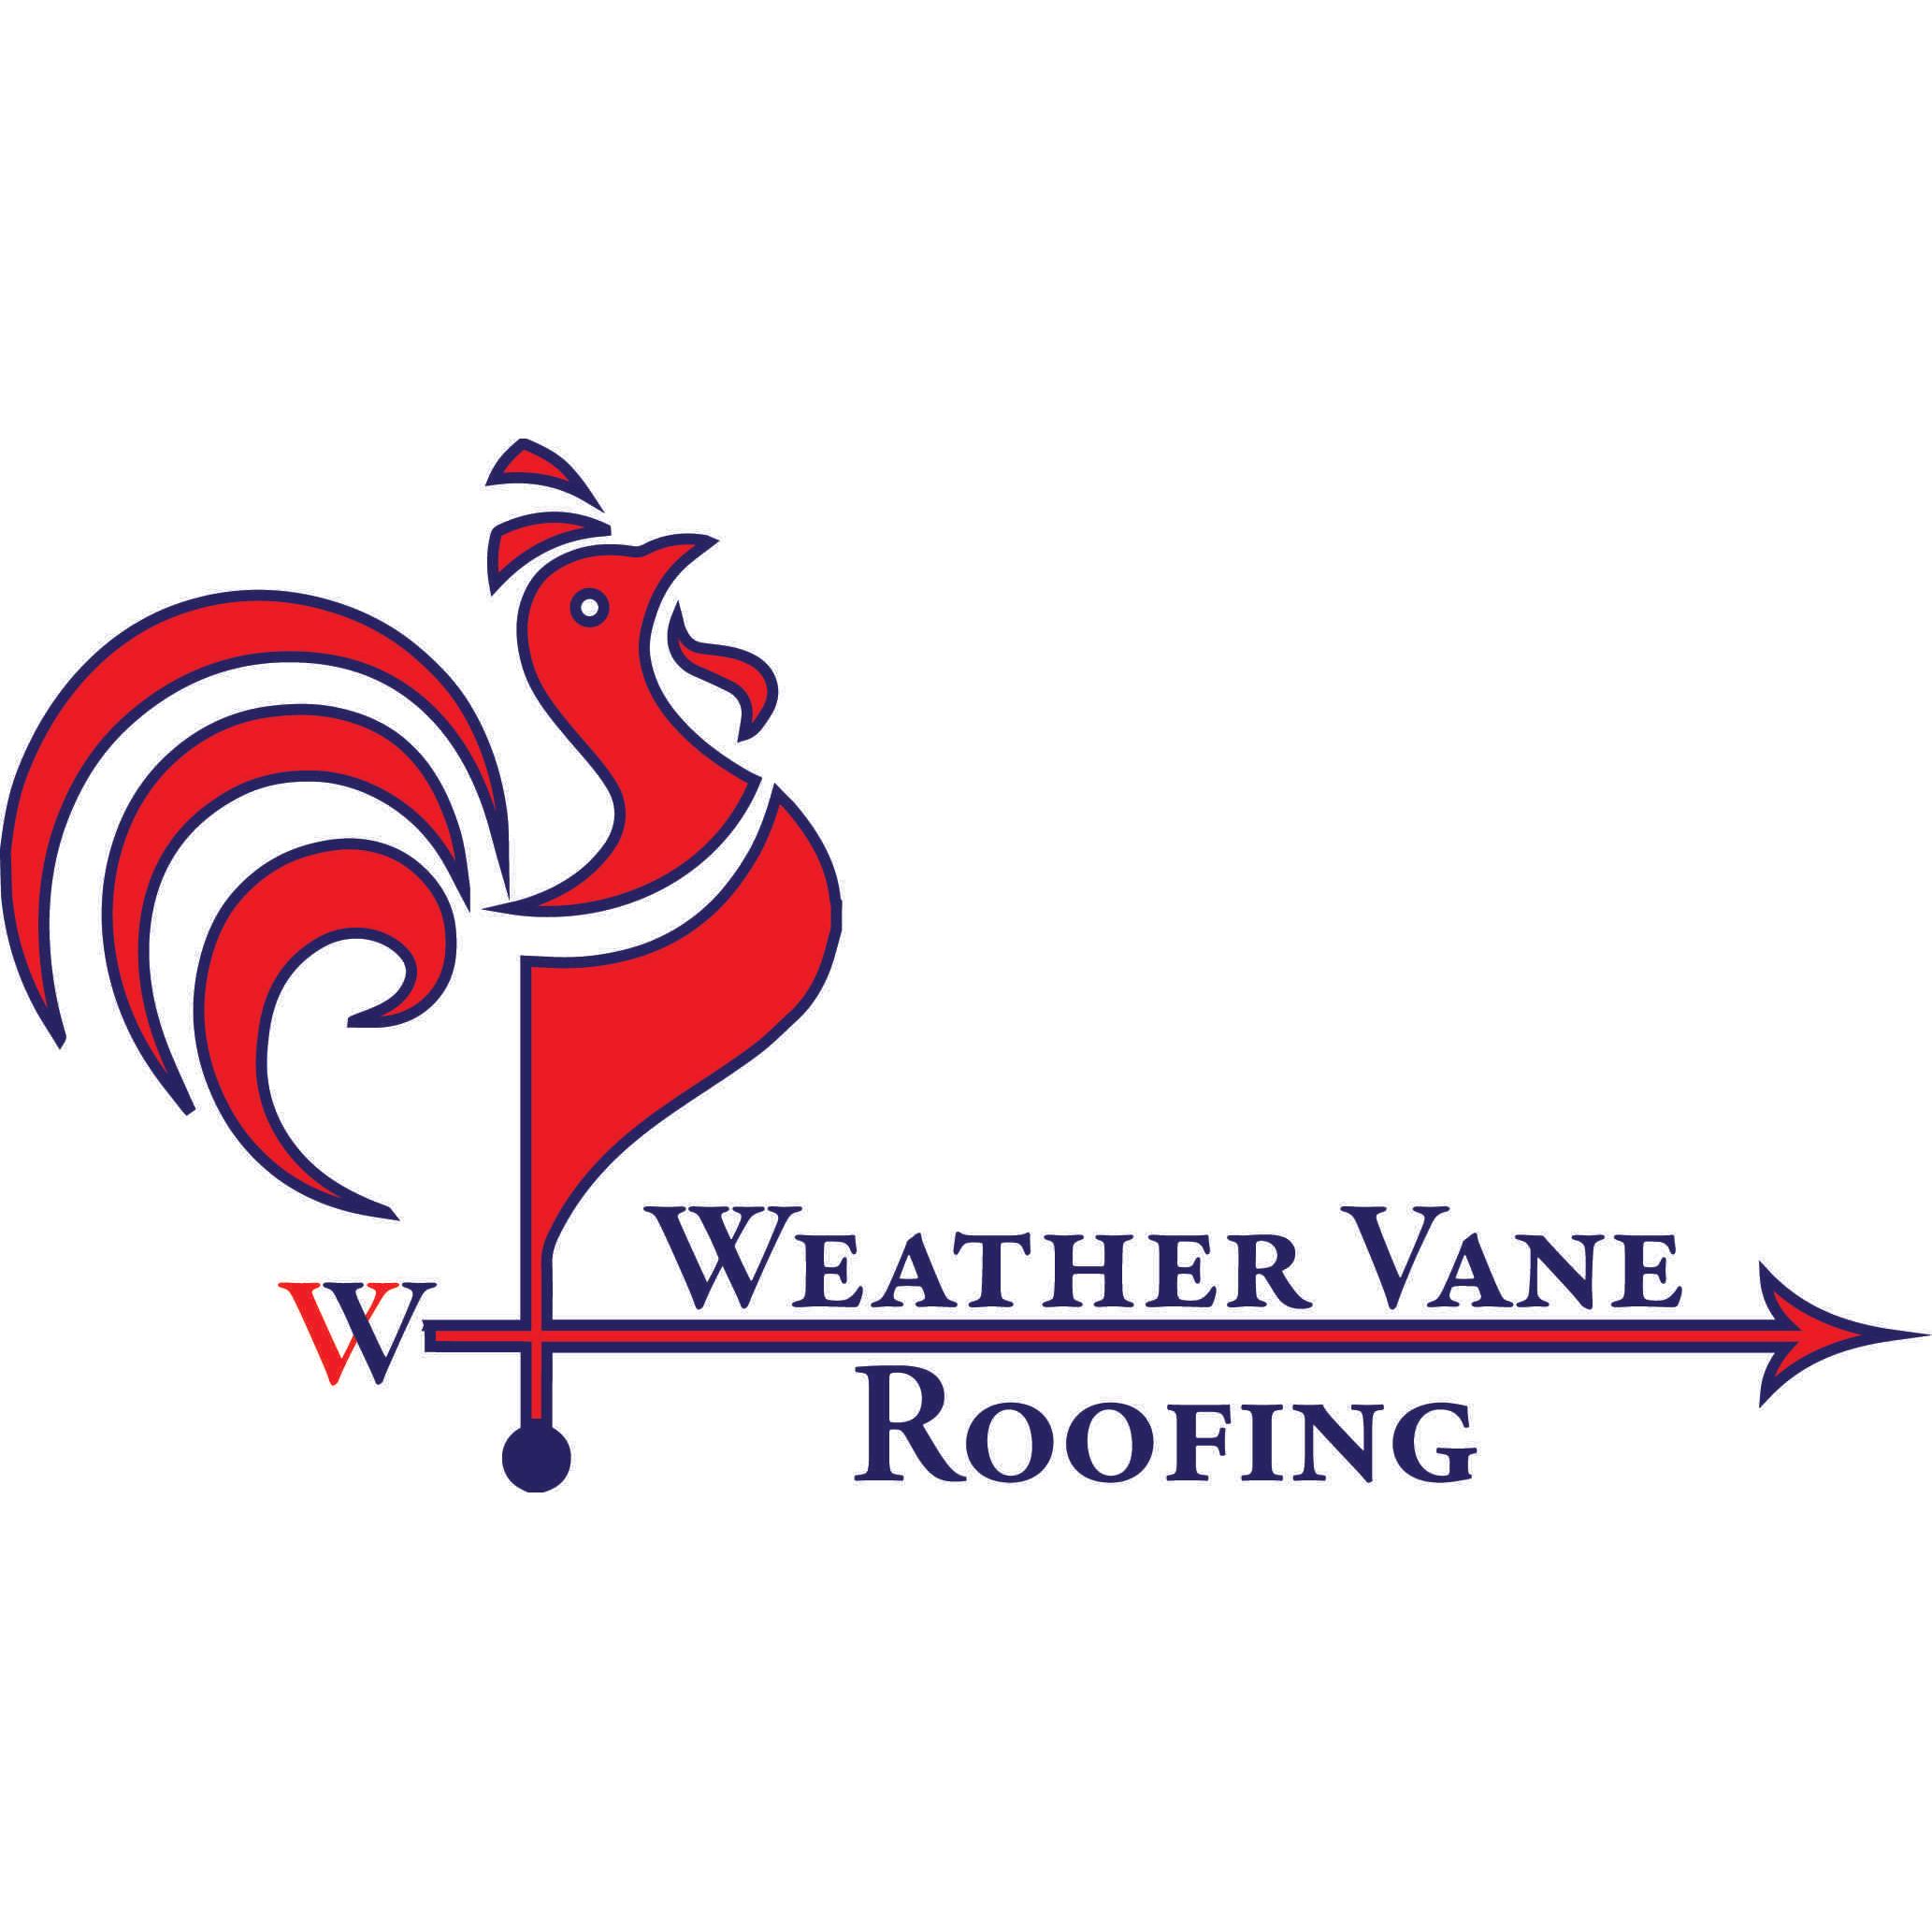 Weather Vane Roofing image 6